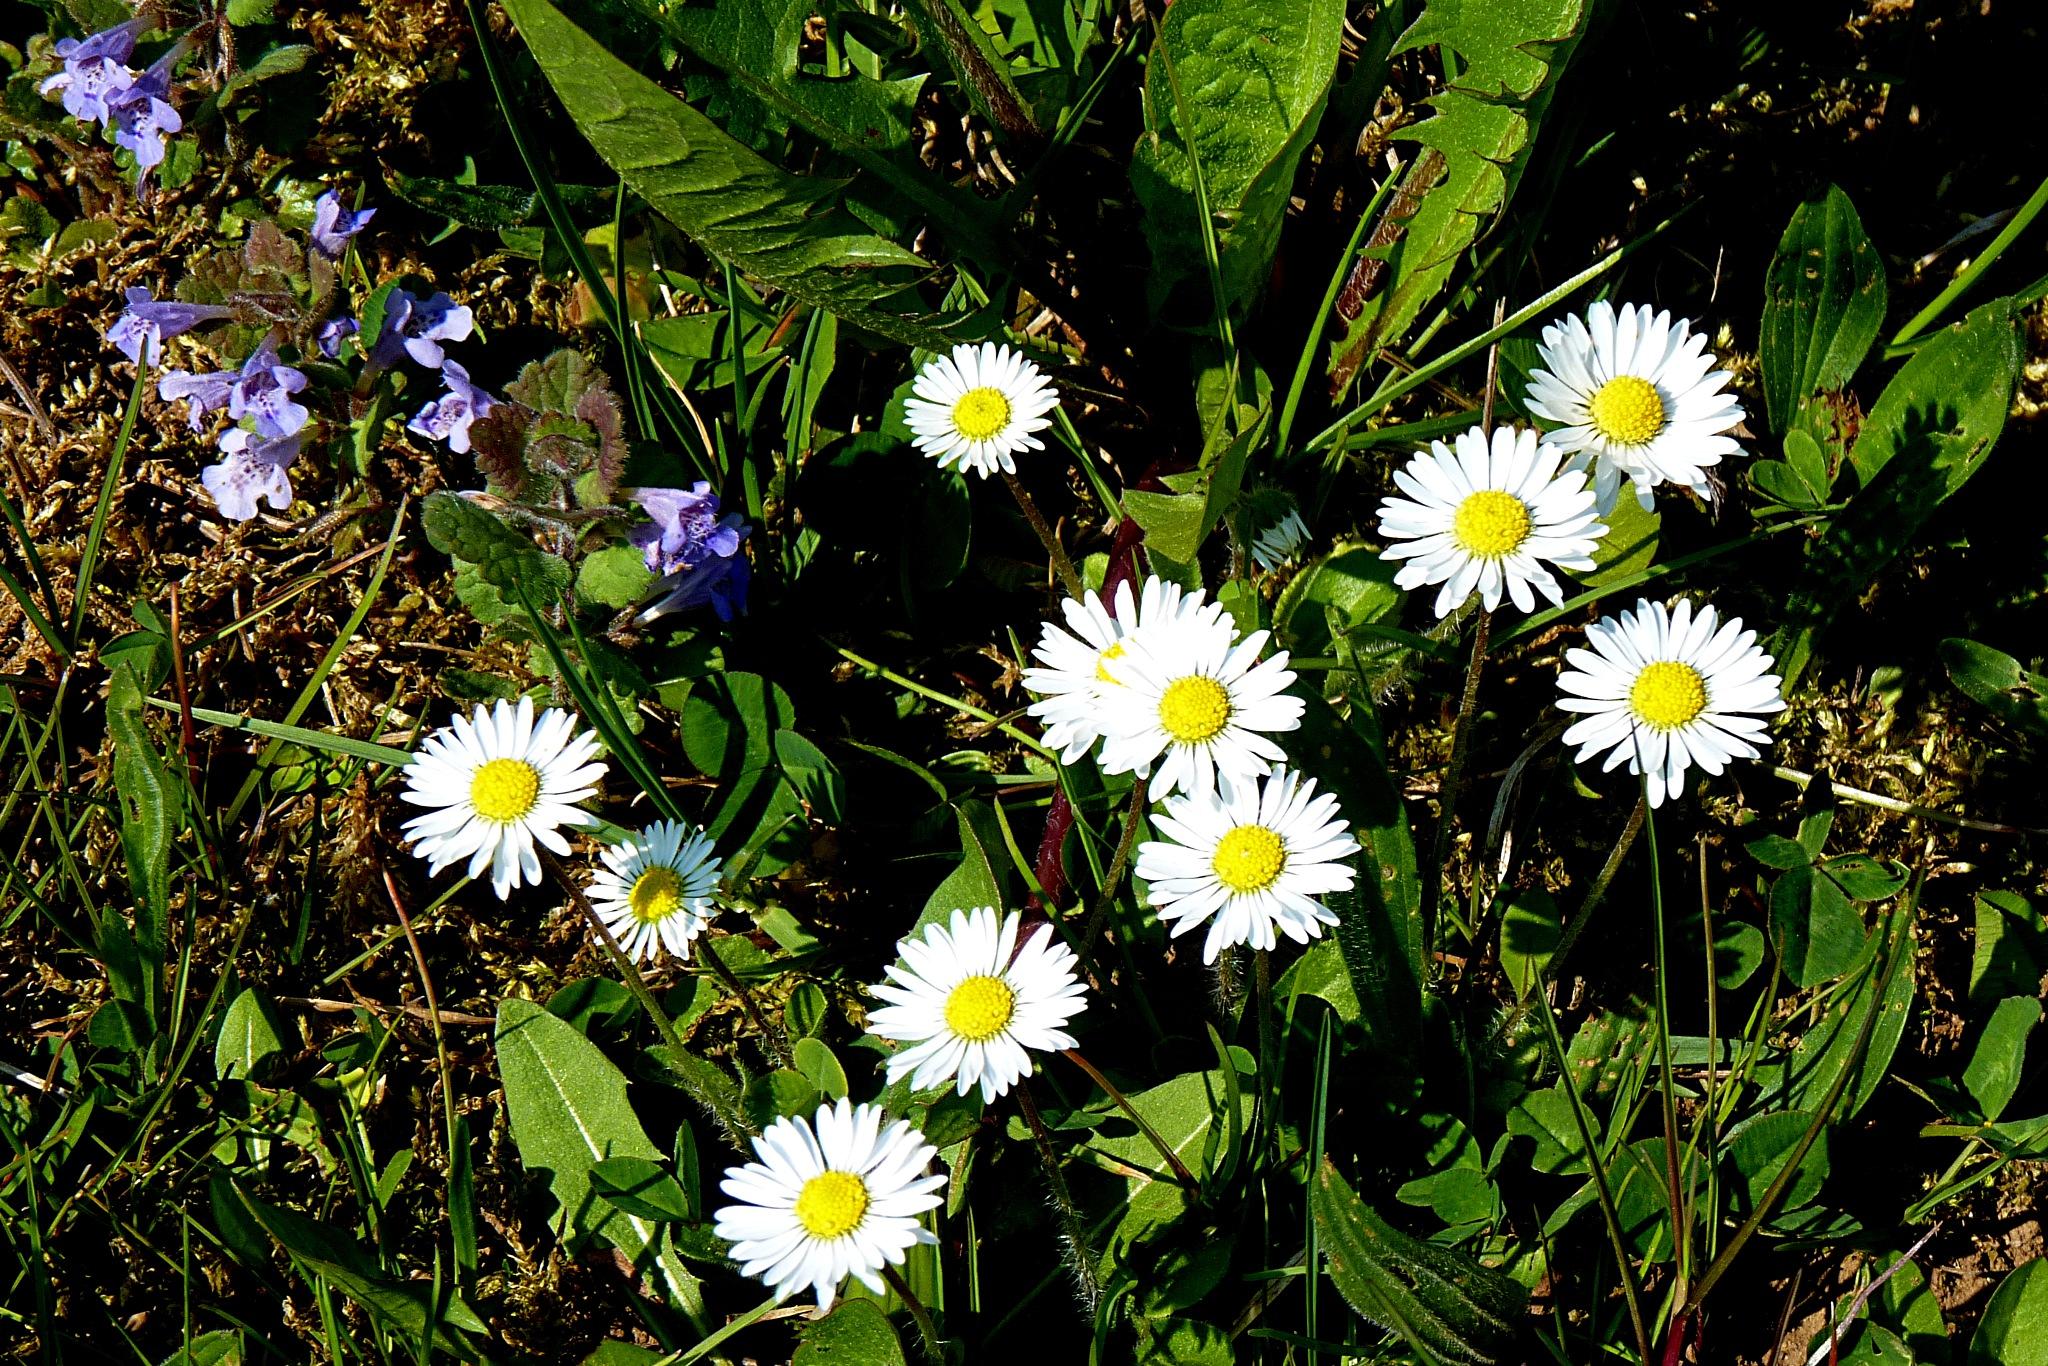 flowers by zvnktomasevic